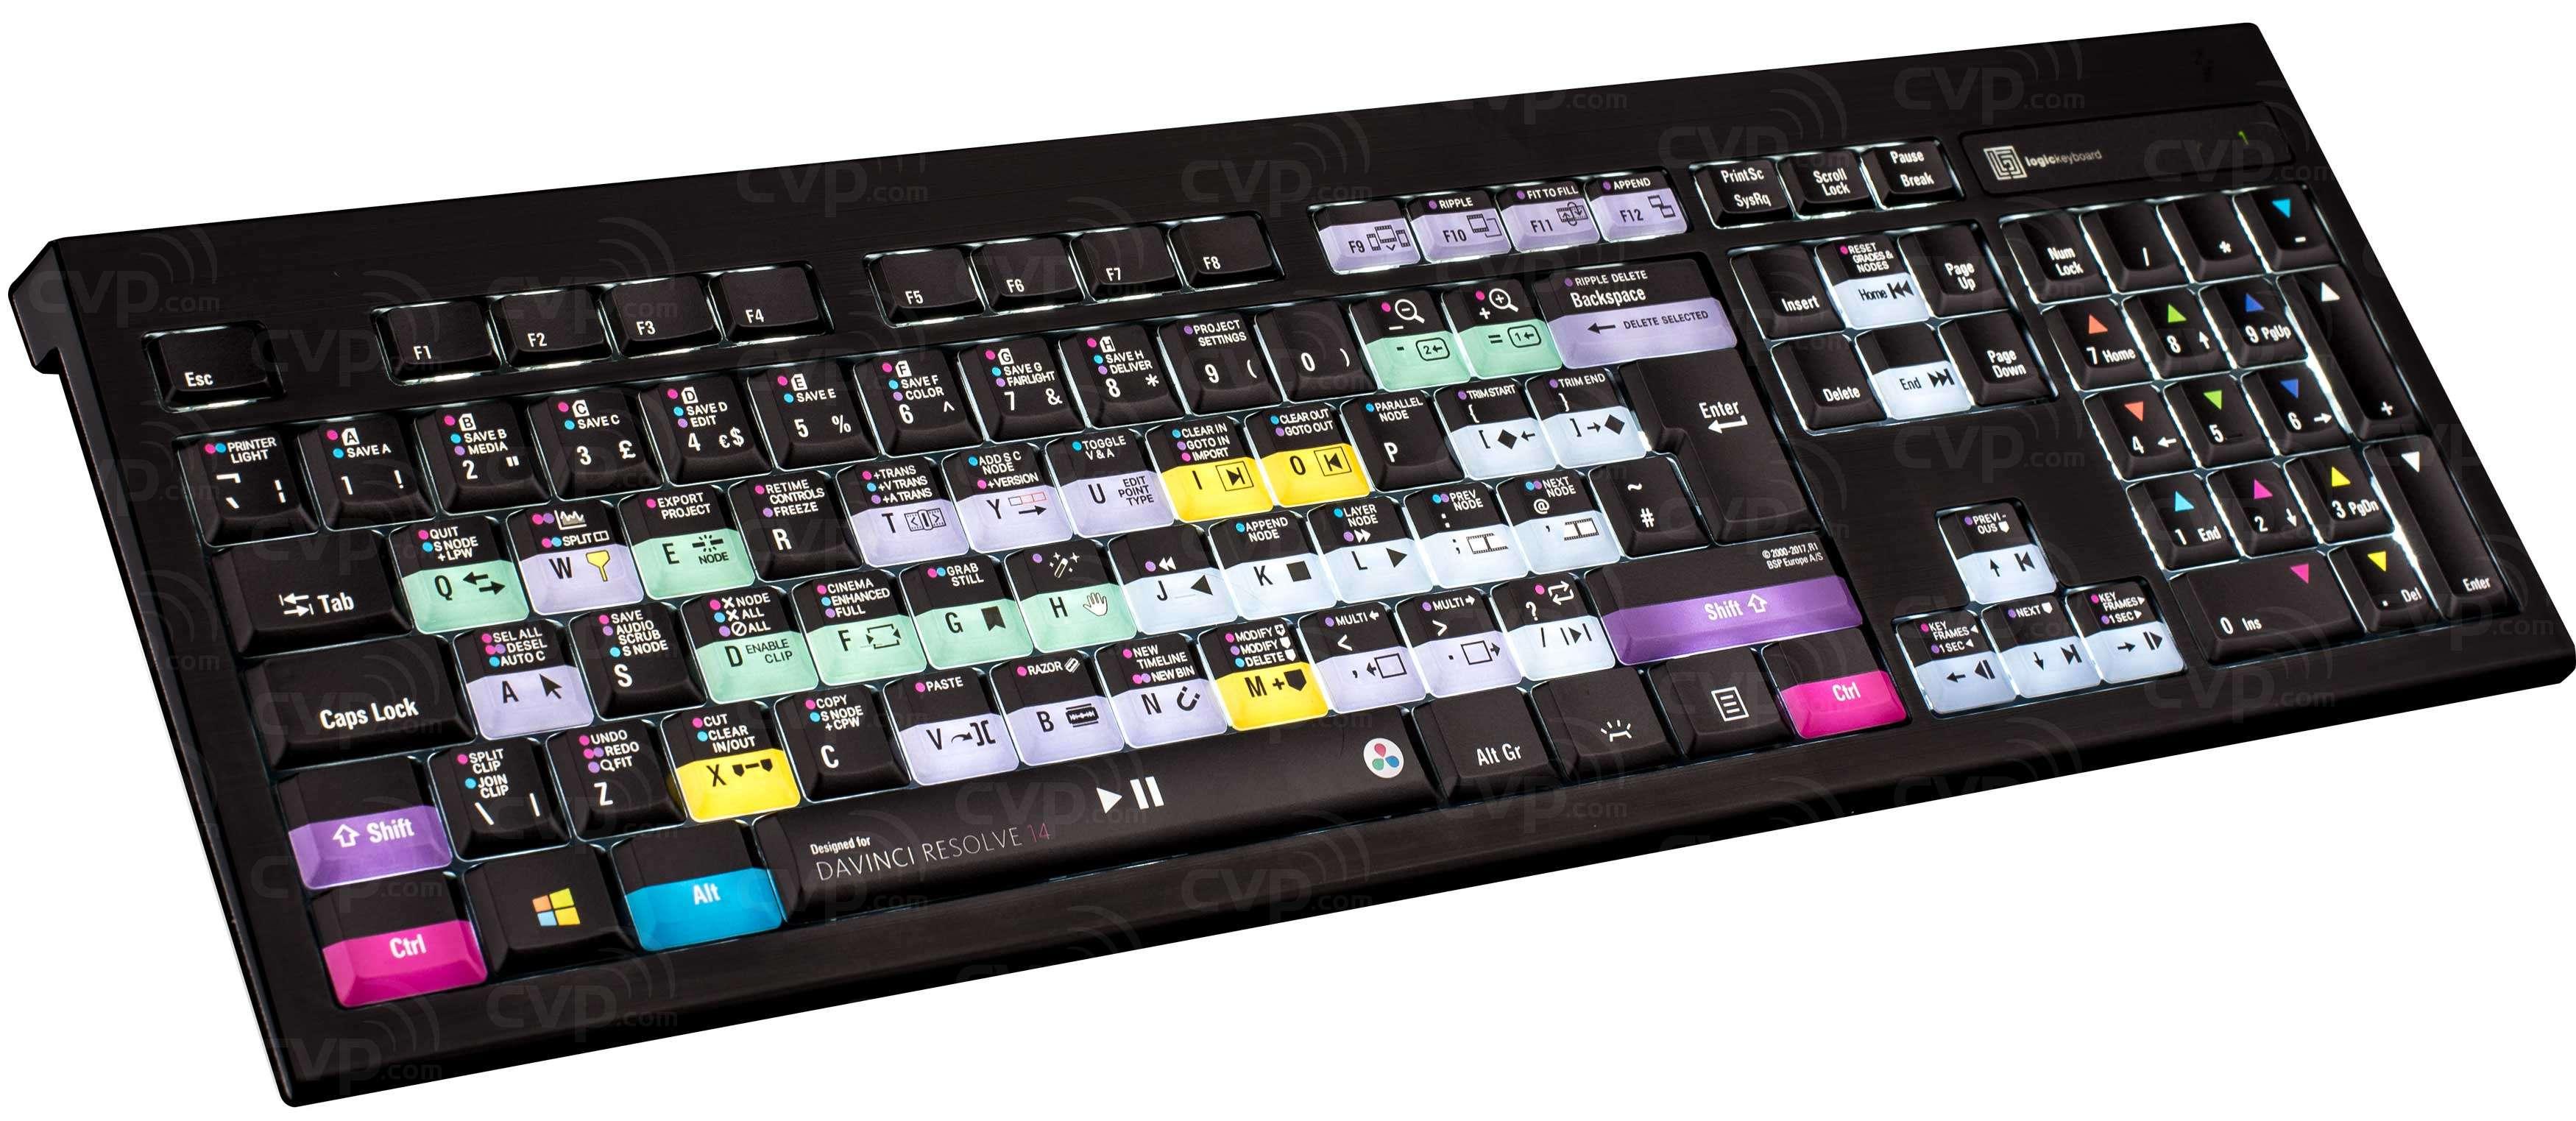 efcbe699532 Buy - Logic Keyboard Blackmagic Design DaVinci Resolve 14 PC Backlit ...